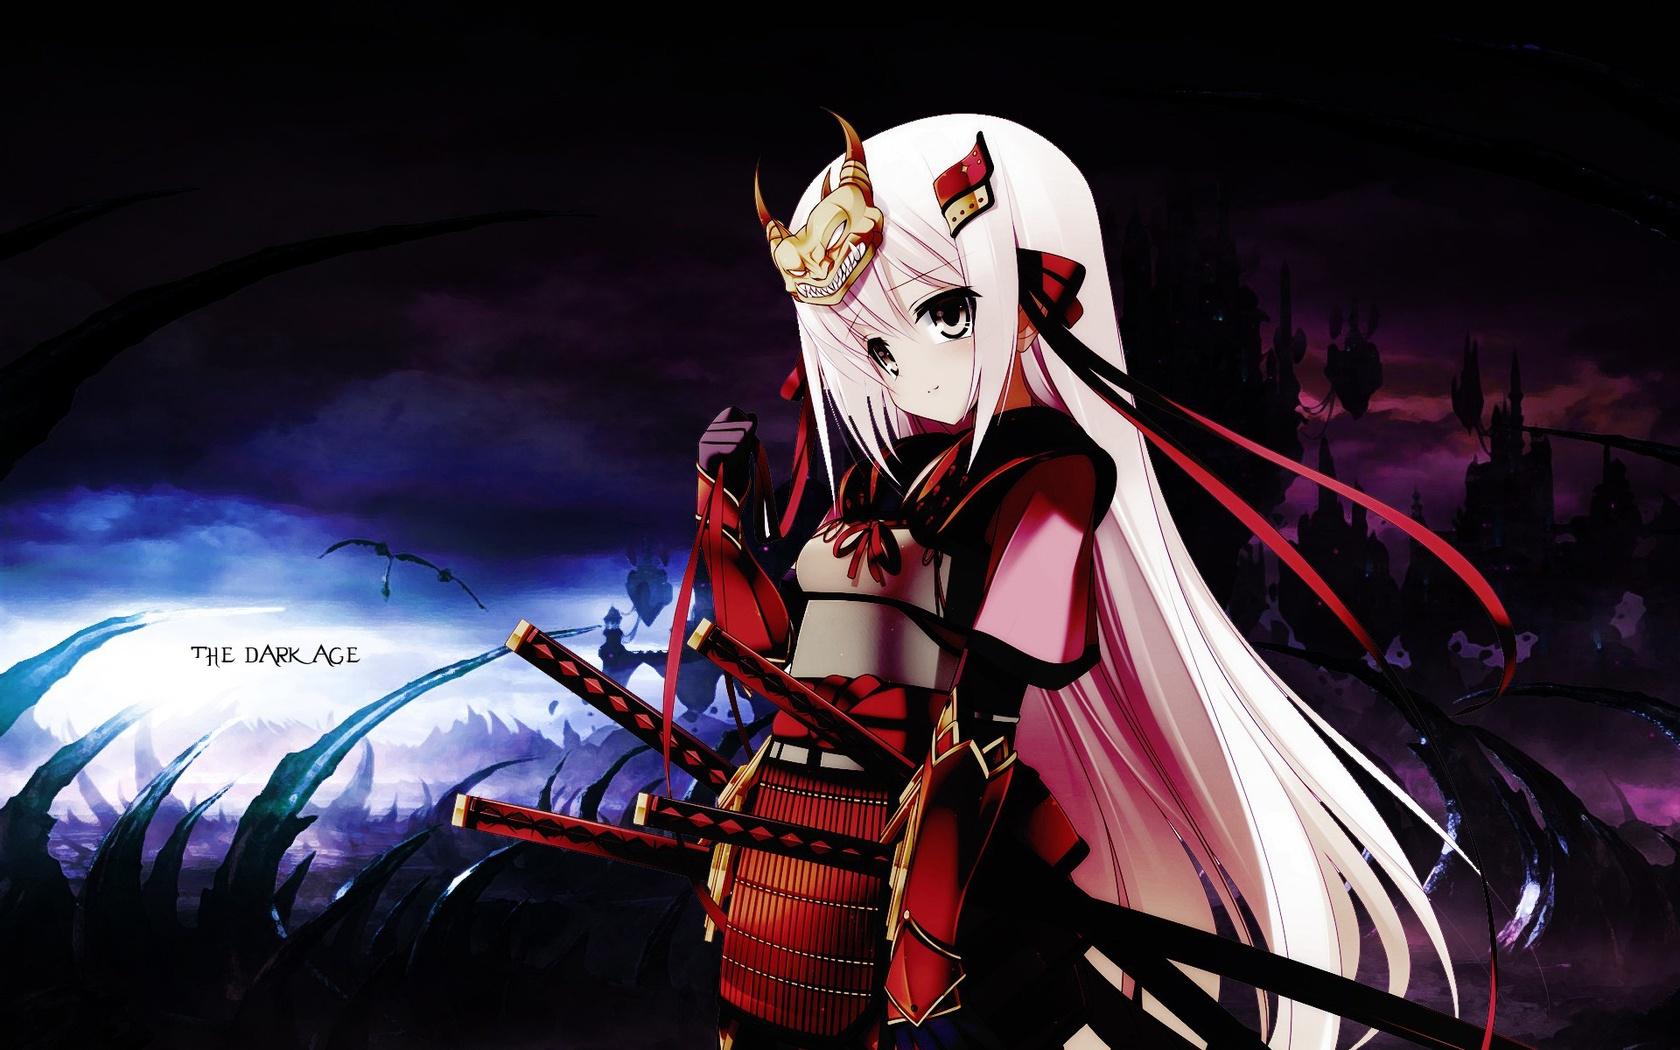 warrior neko girl wallpaper - photo #20